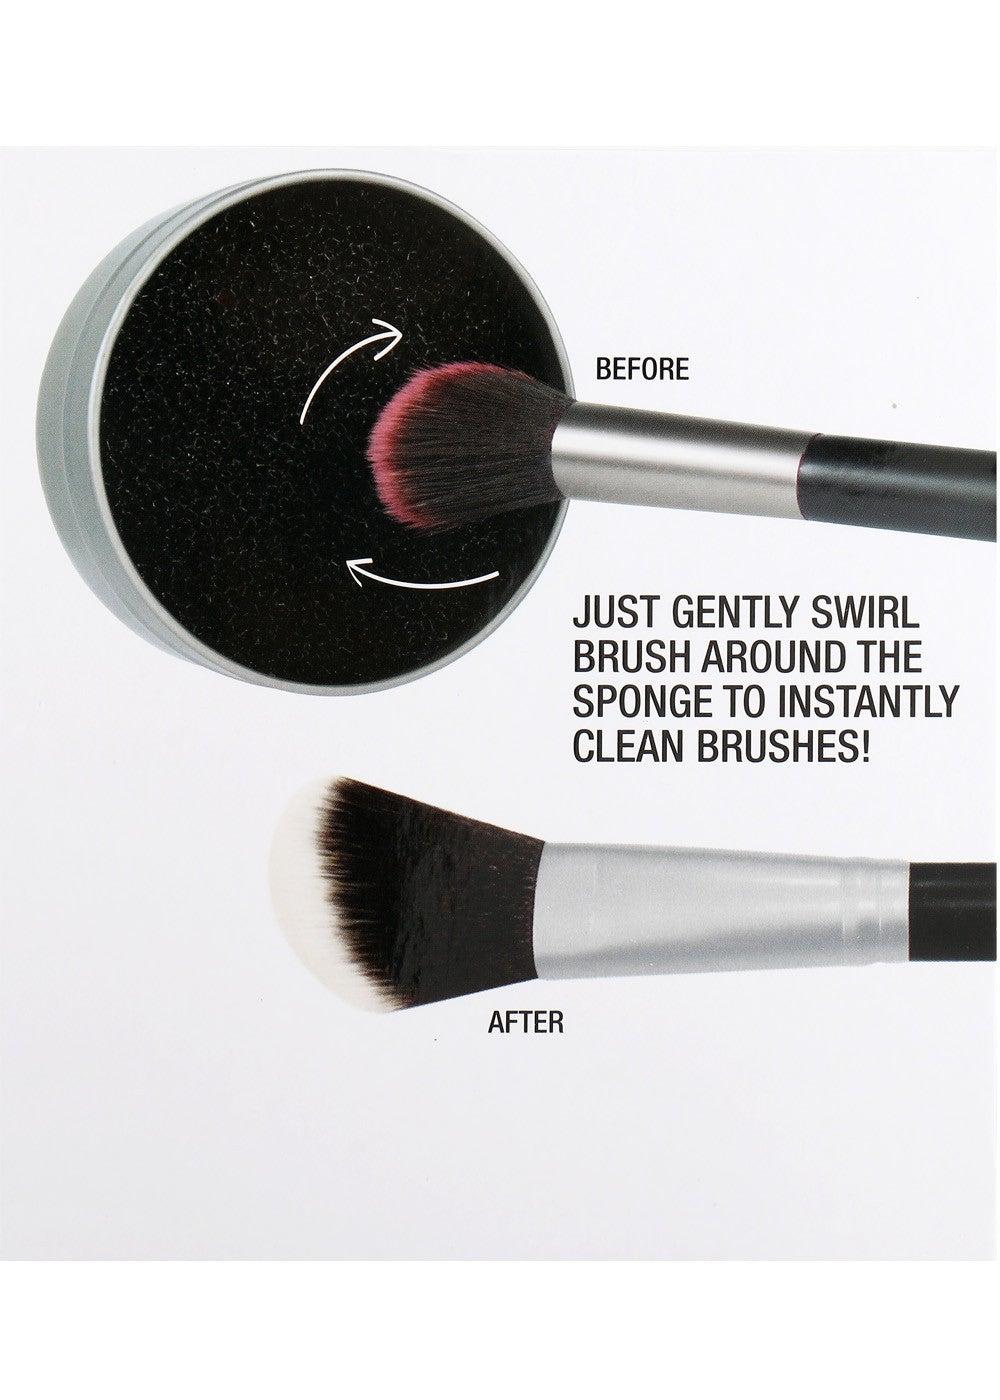 Image of Waterless brush cleaning sponge